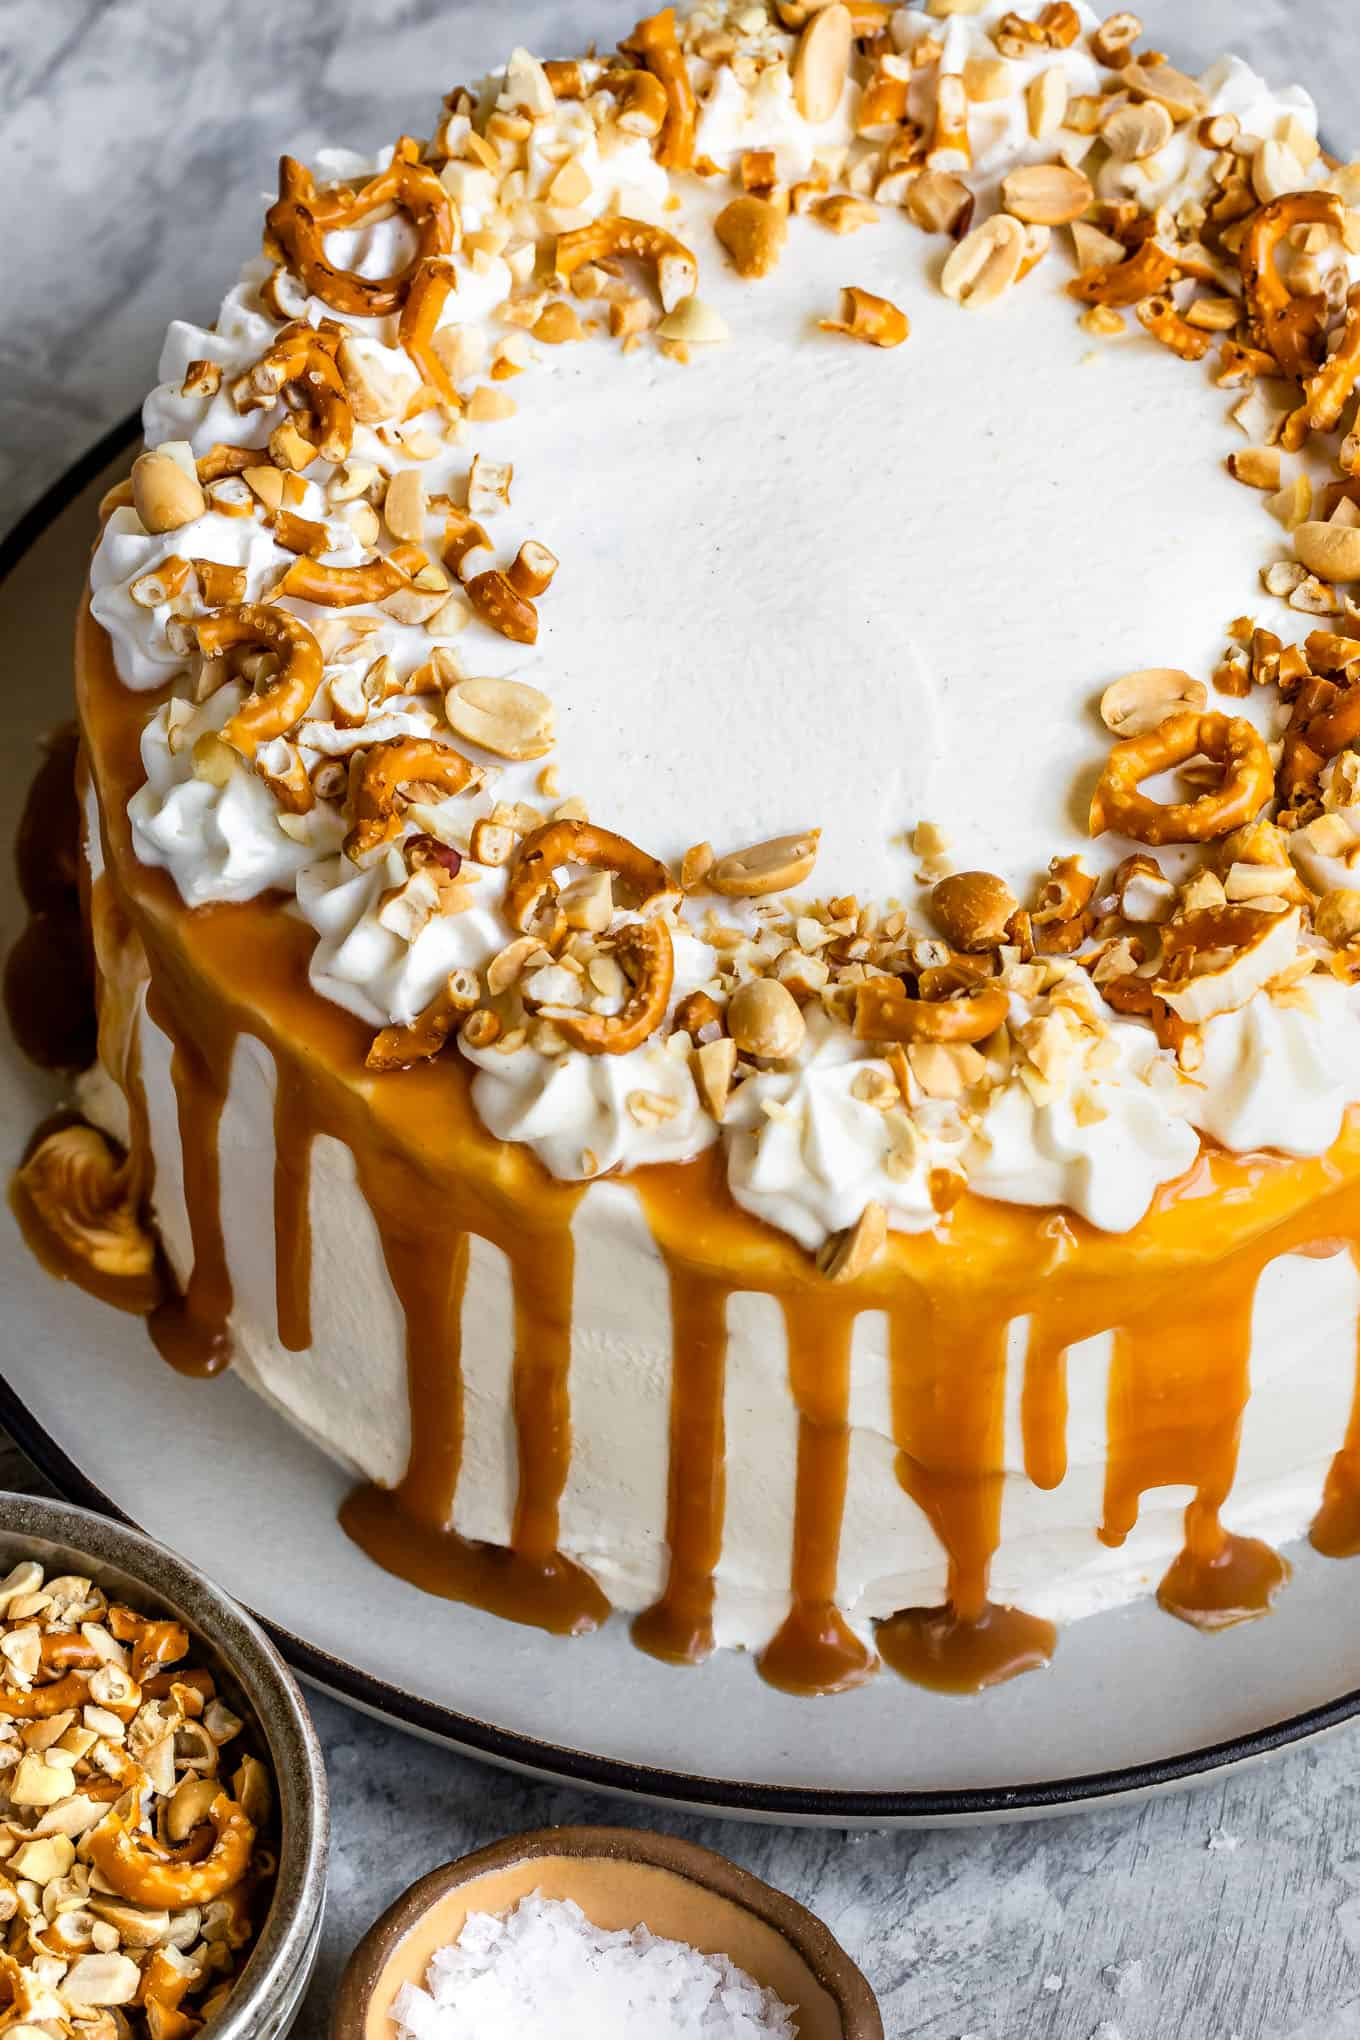 Chocolate & Caramel Gluten-Free Ice Cream Cake Recipe